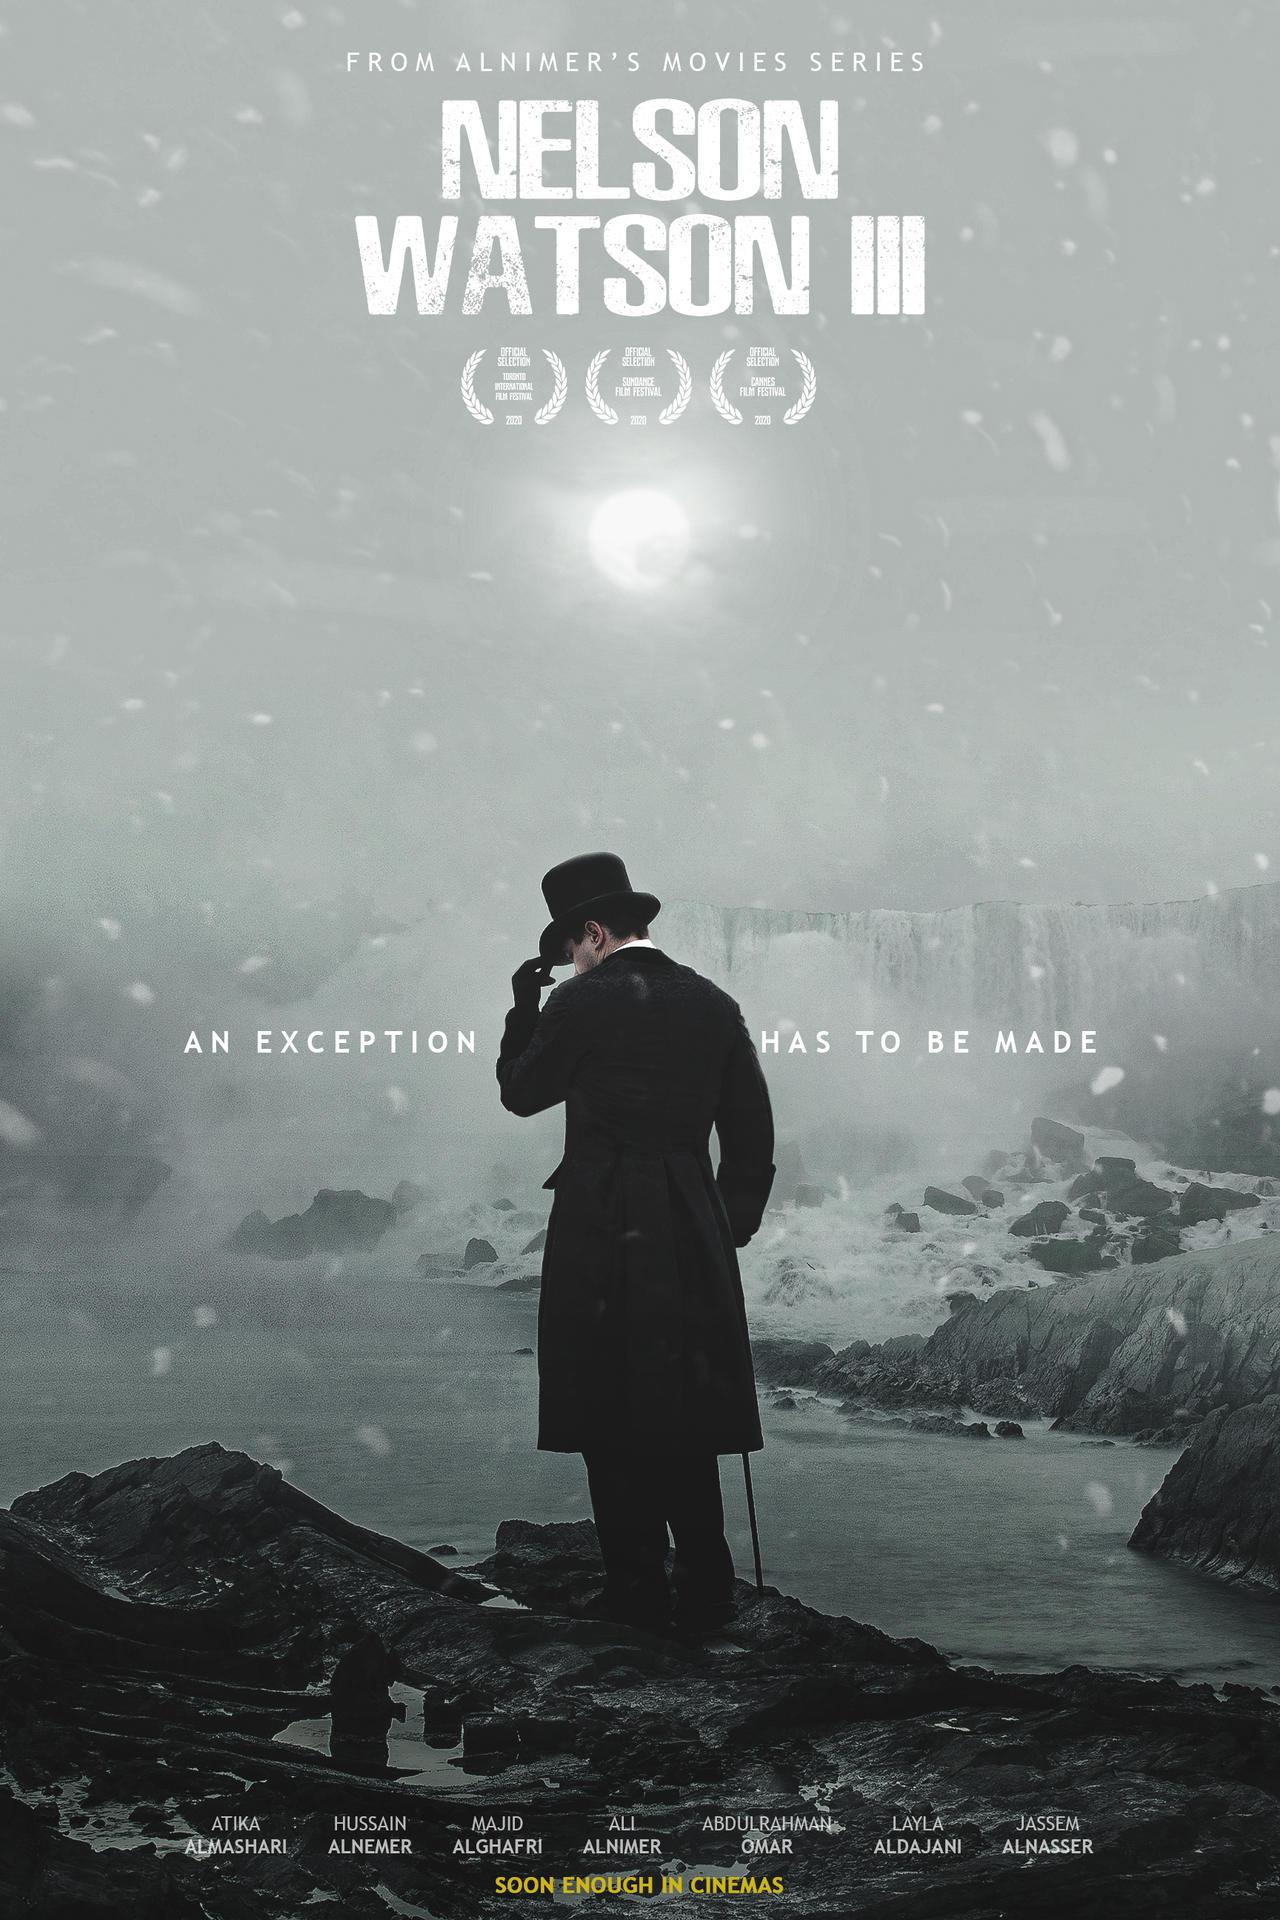 NELSON WATSON III (Imaginary Movie Poster)